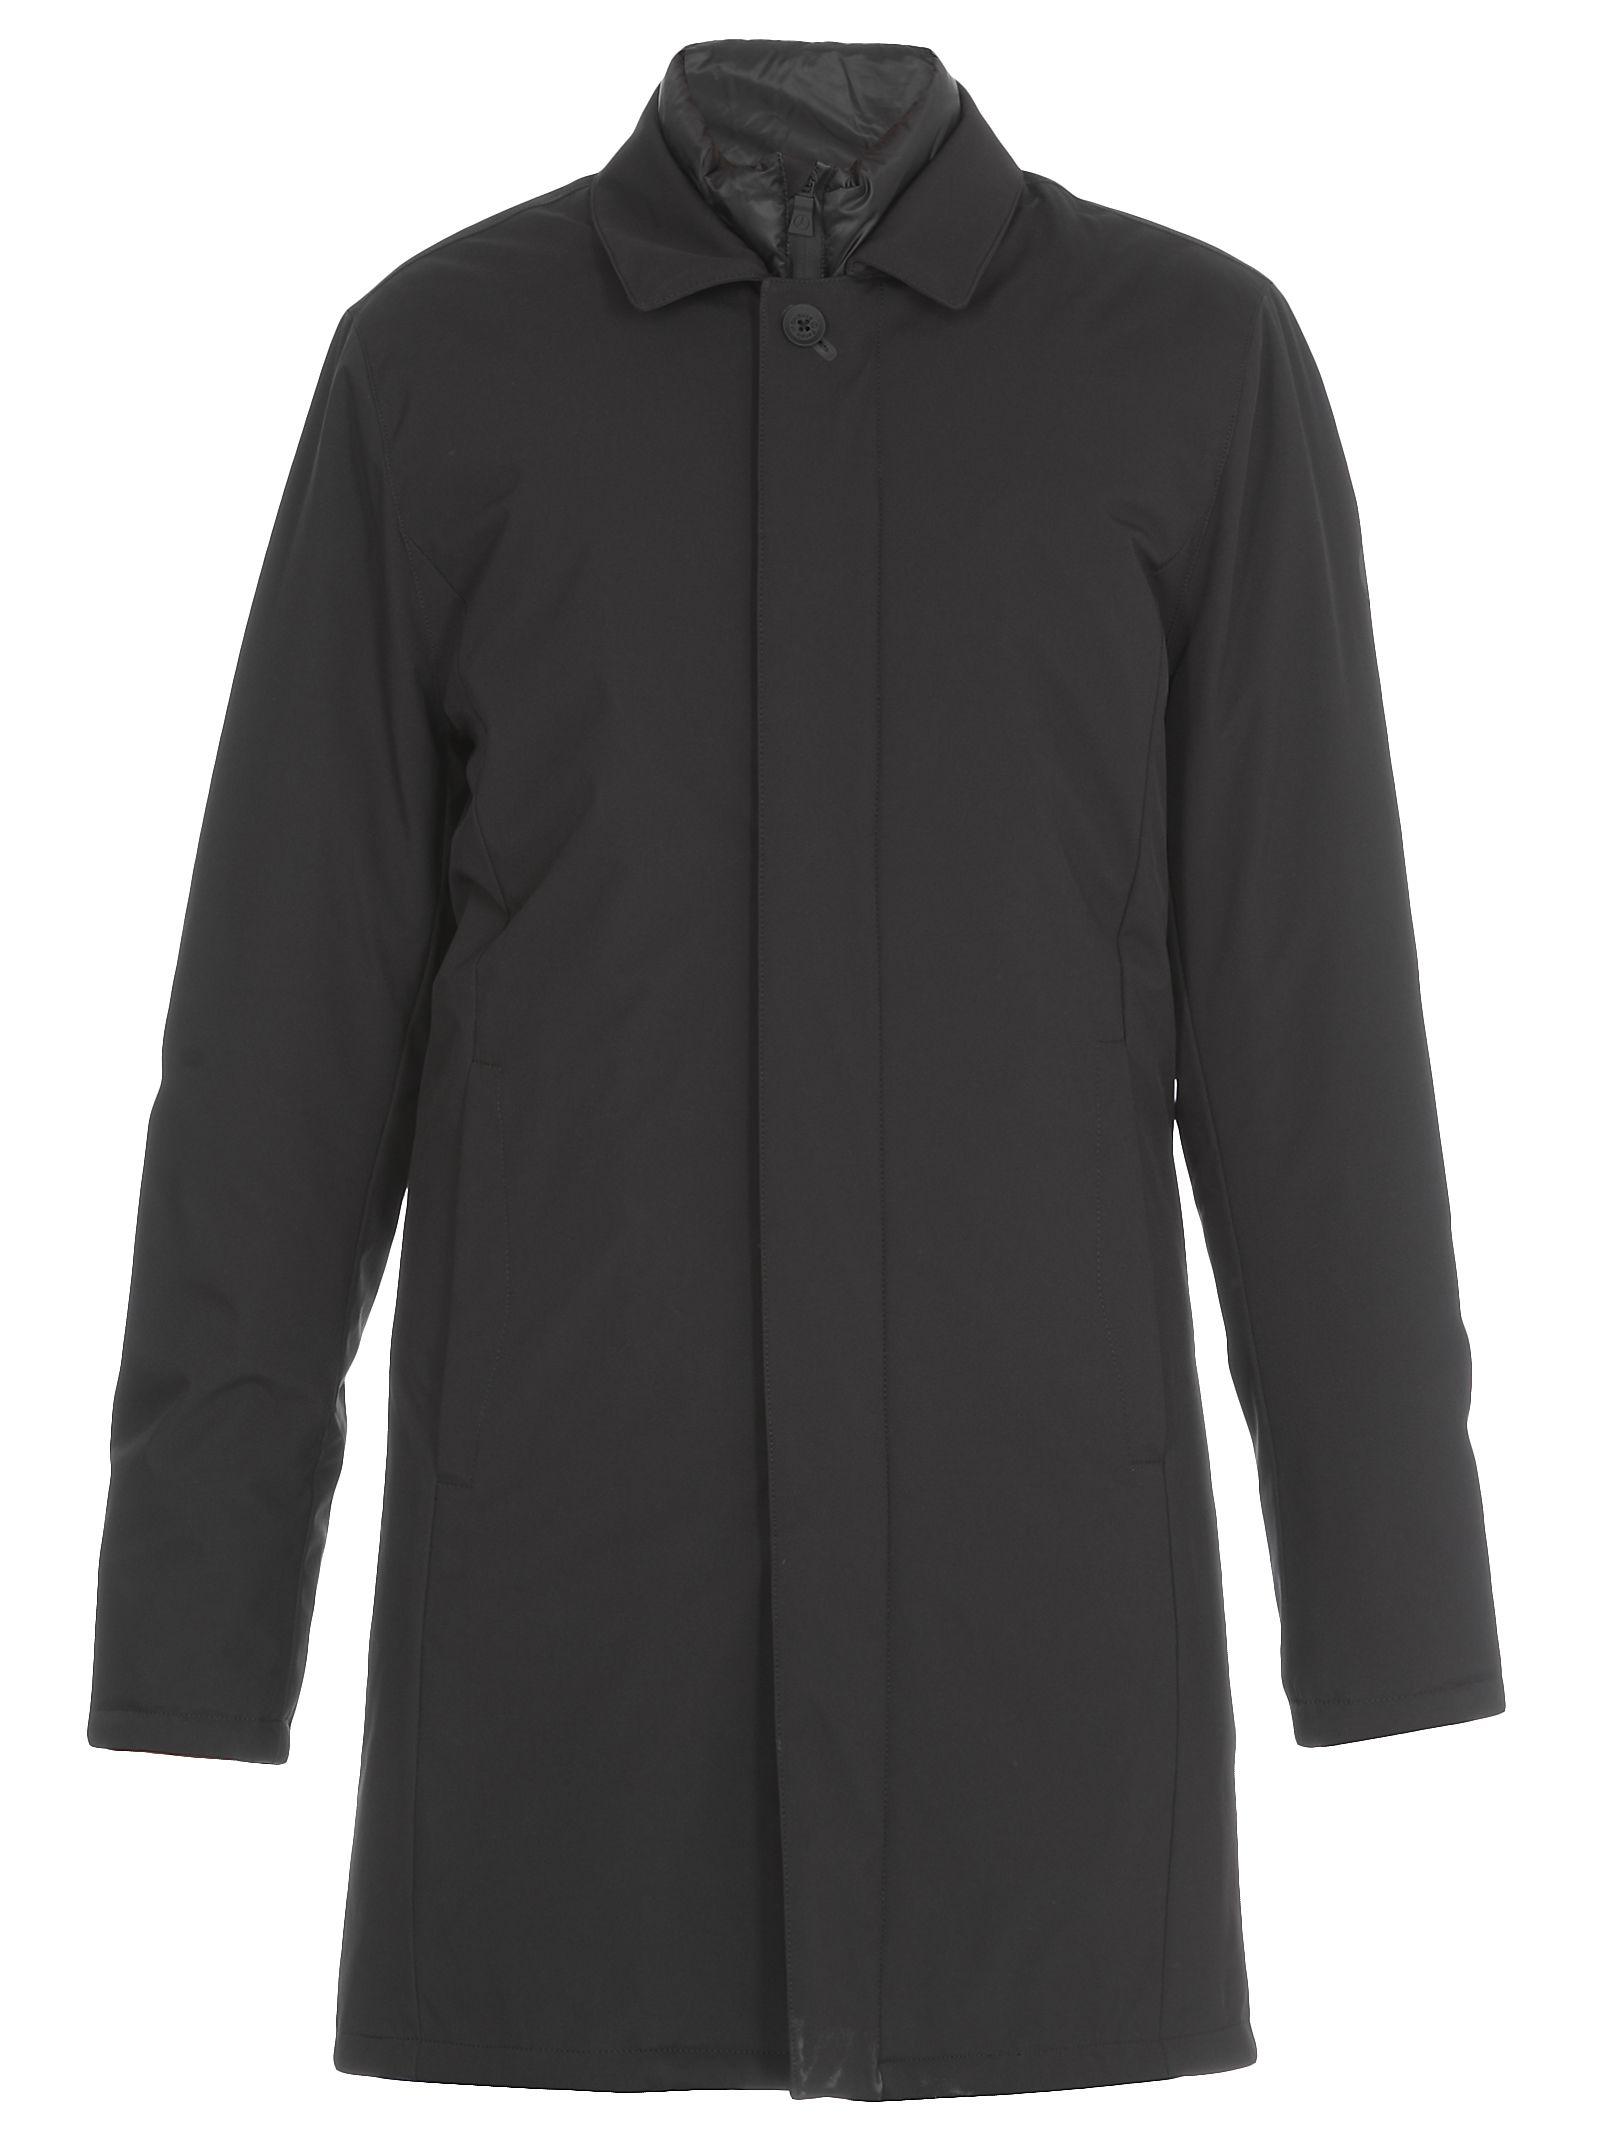 PEOPLE OF SHIBUYA Kai Coat in Black